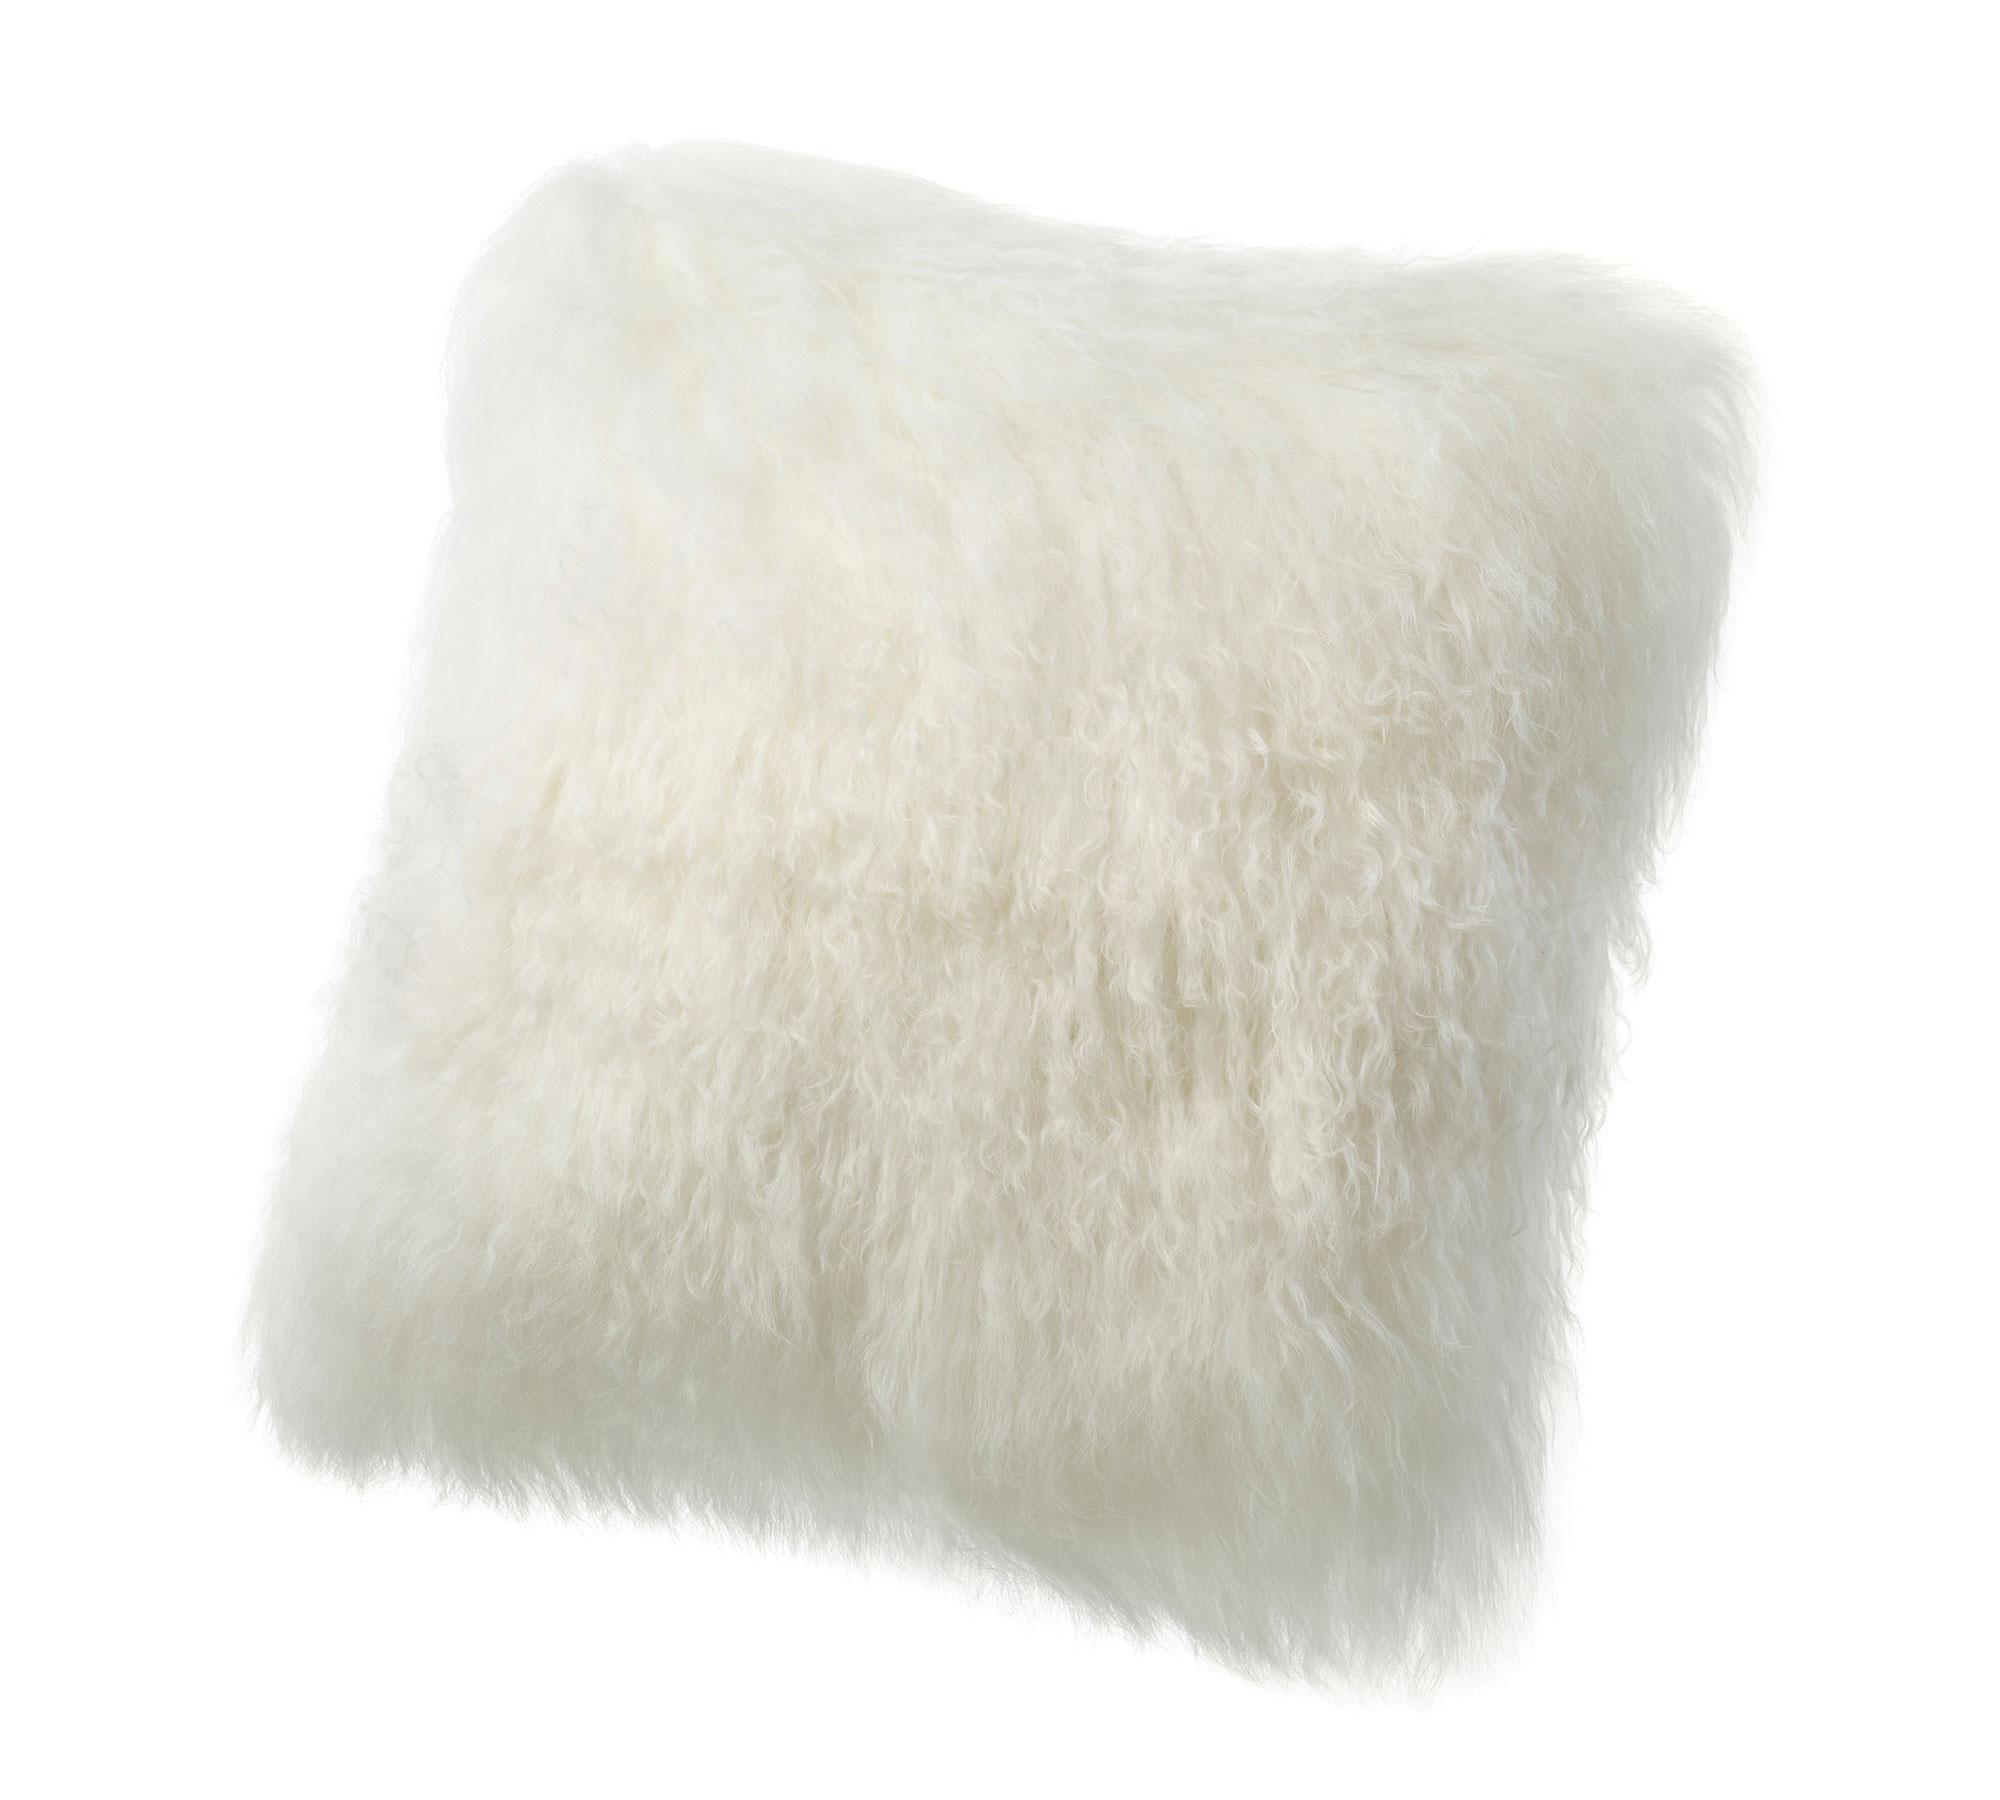 Tibetan Lambskin Curly Fur throw pillows ivory white